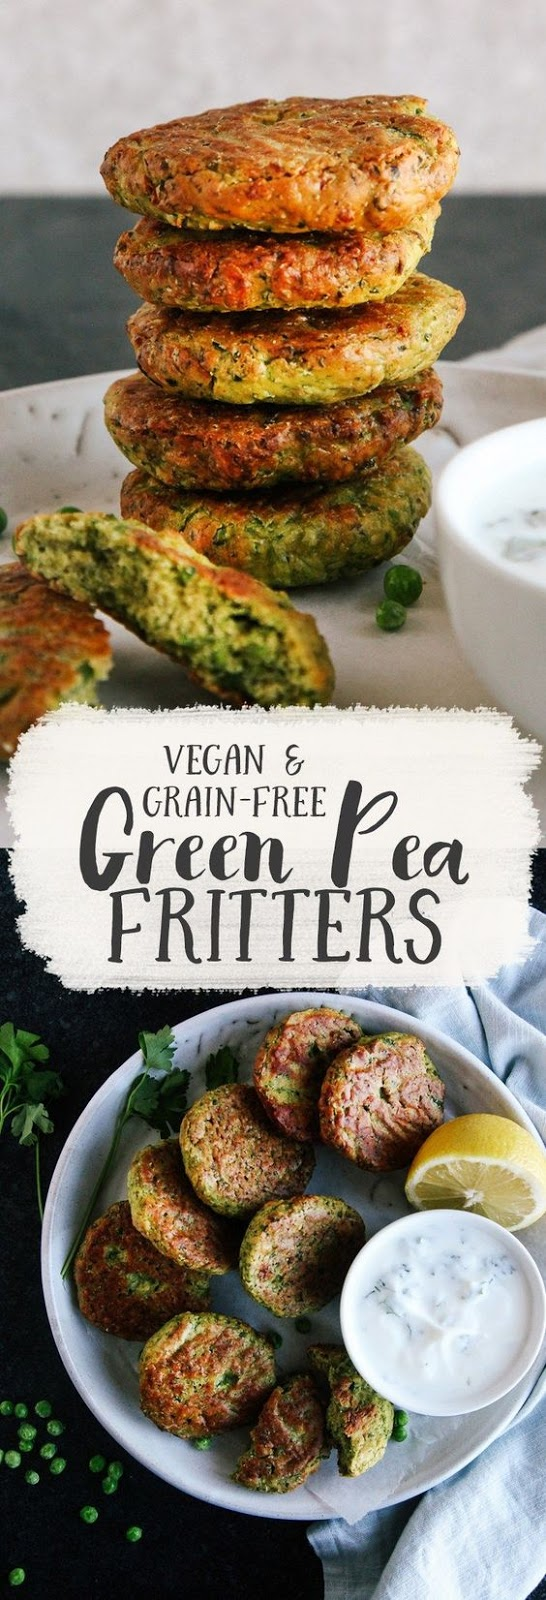 GREEN PEA FRITTERS (VEGAN + GF)